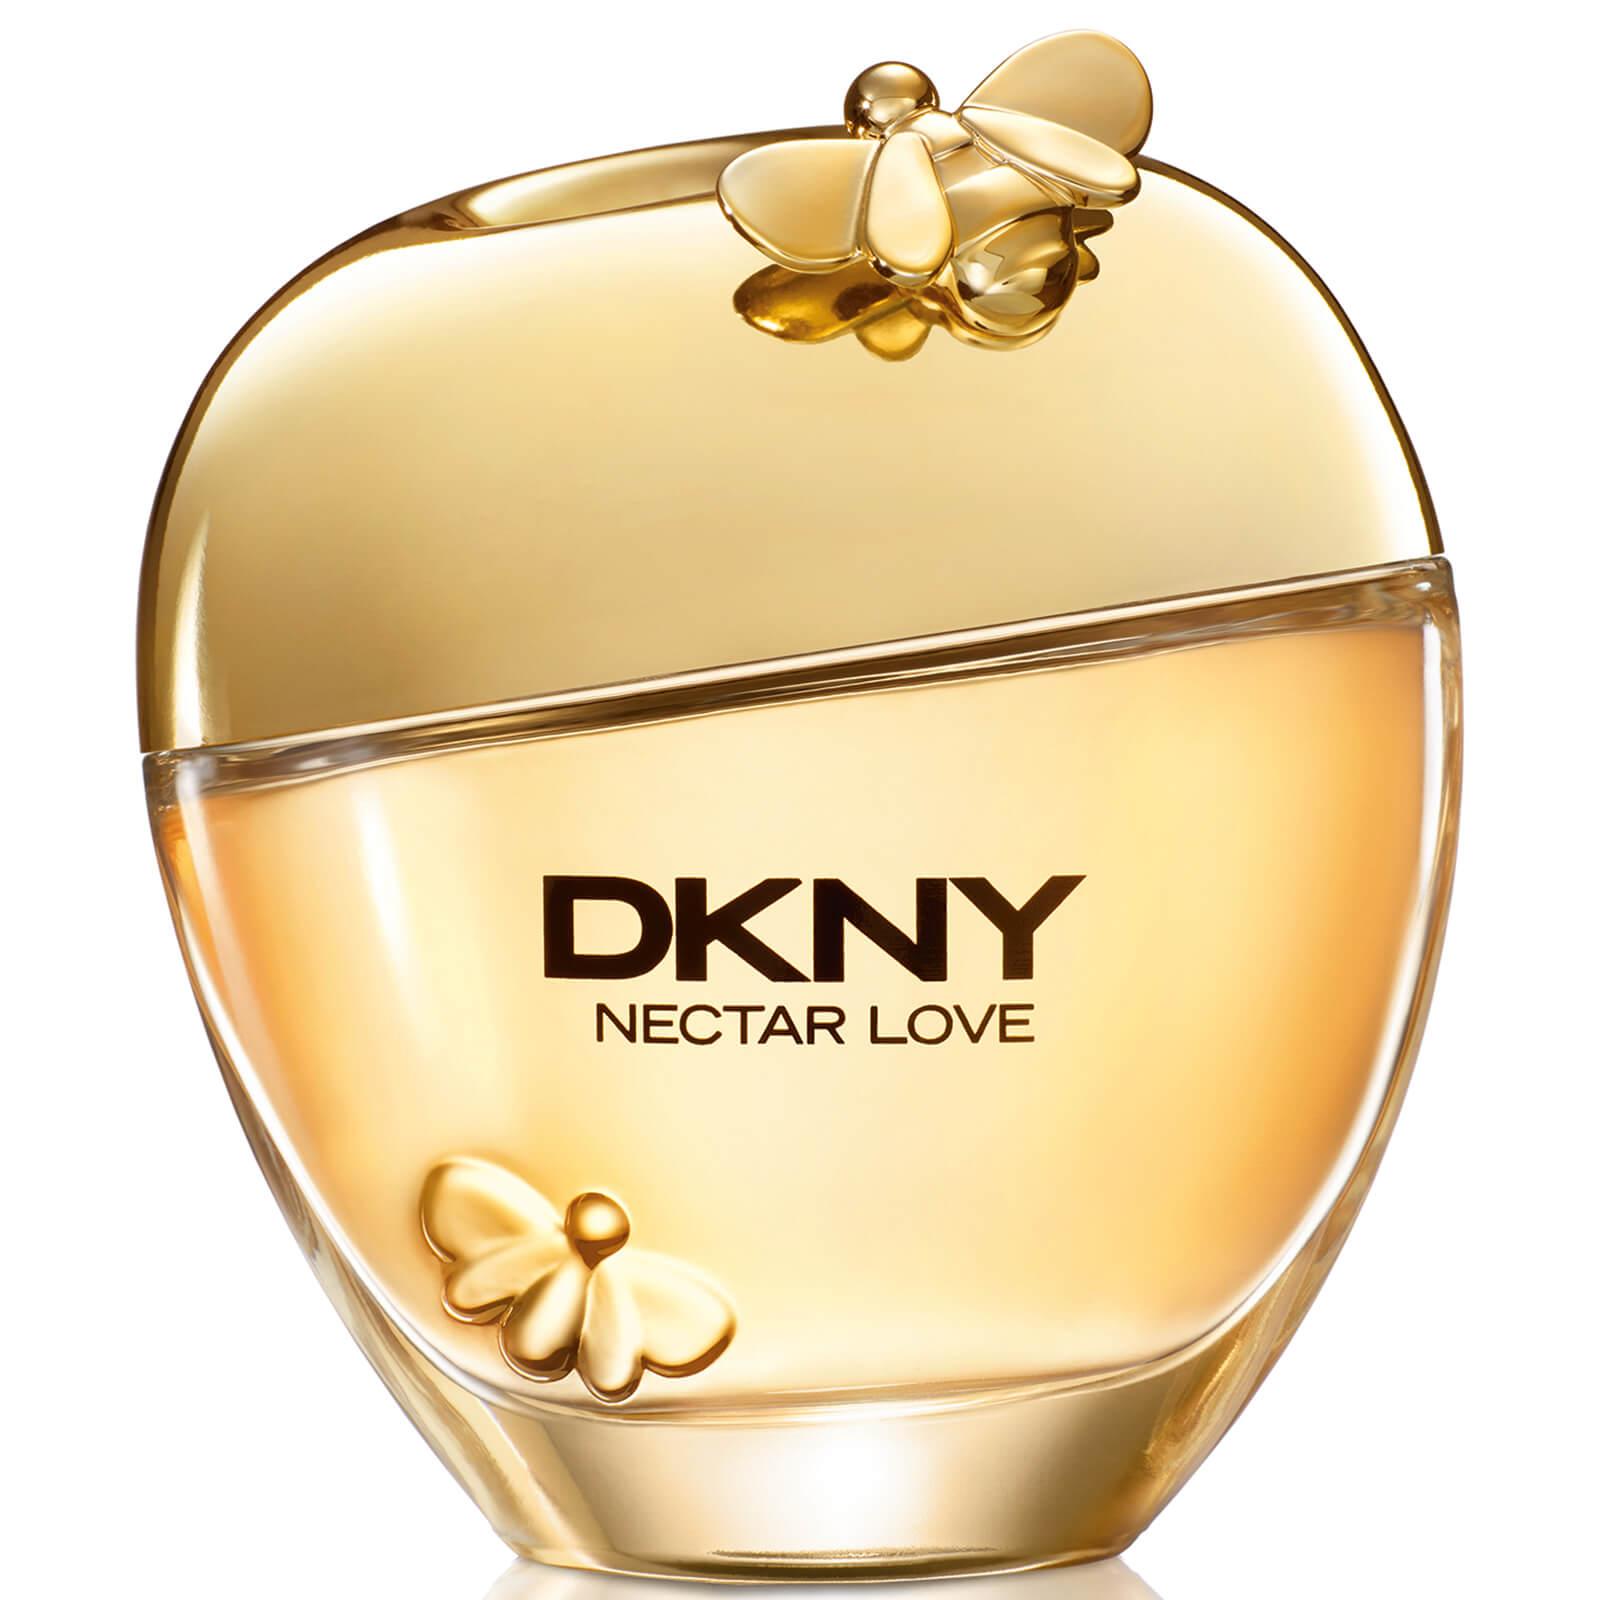 Dkny Nectar Love Eau De Parfum 100ml Free Shipping Lookfantastic